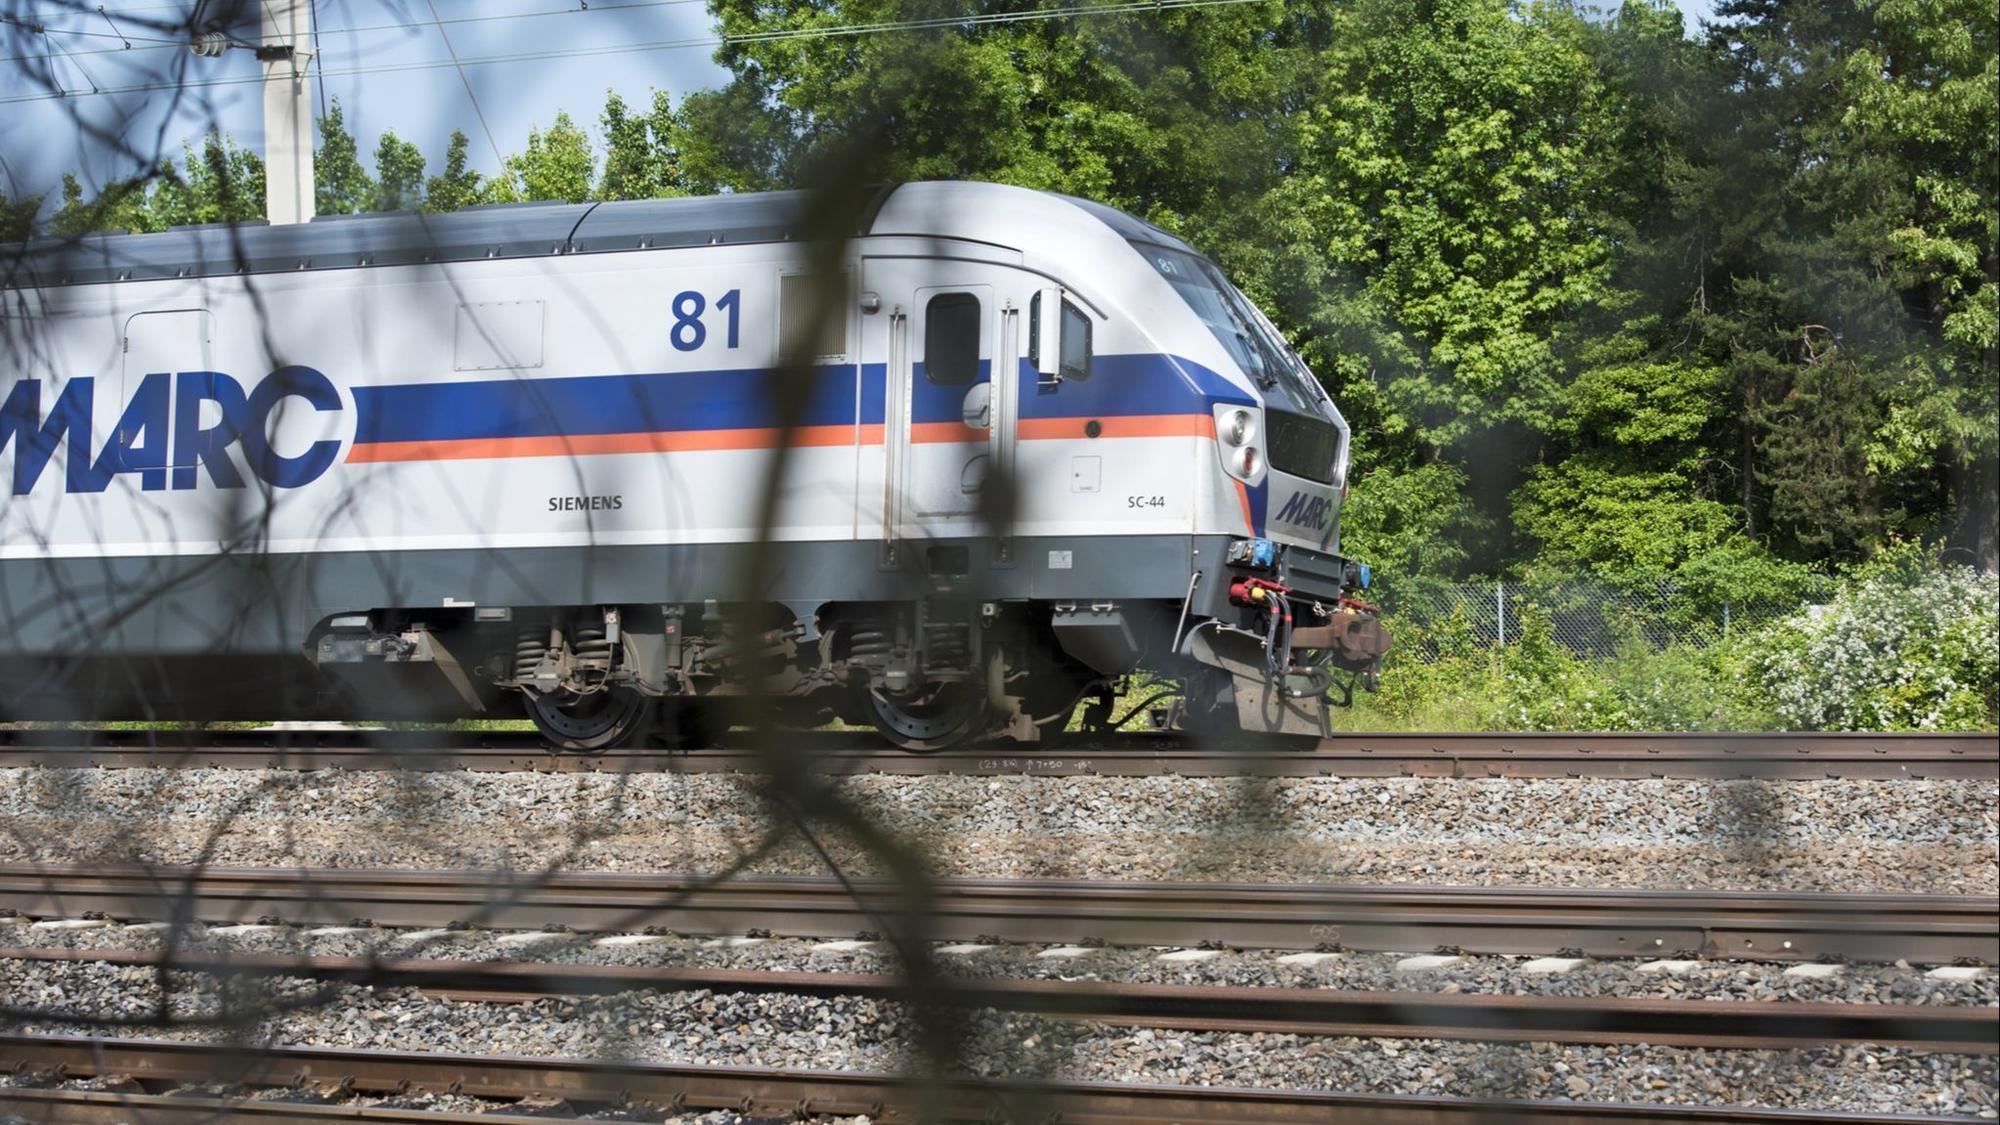 Train strikes pedestrian on MARC Penn Line in Odenton